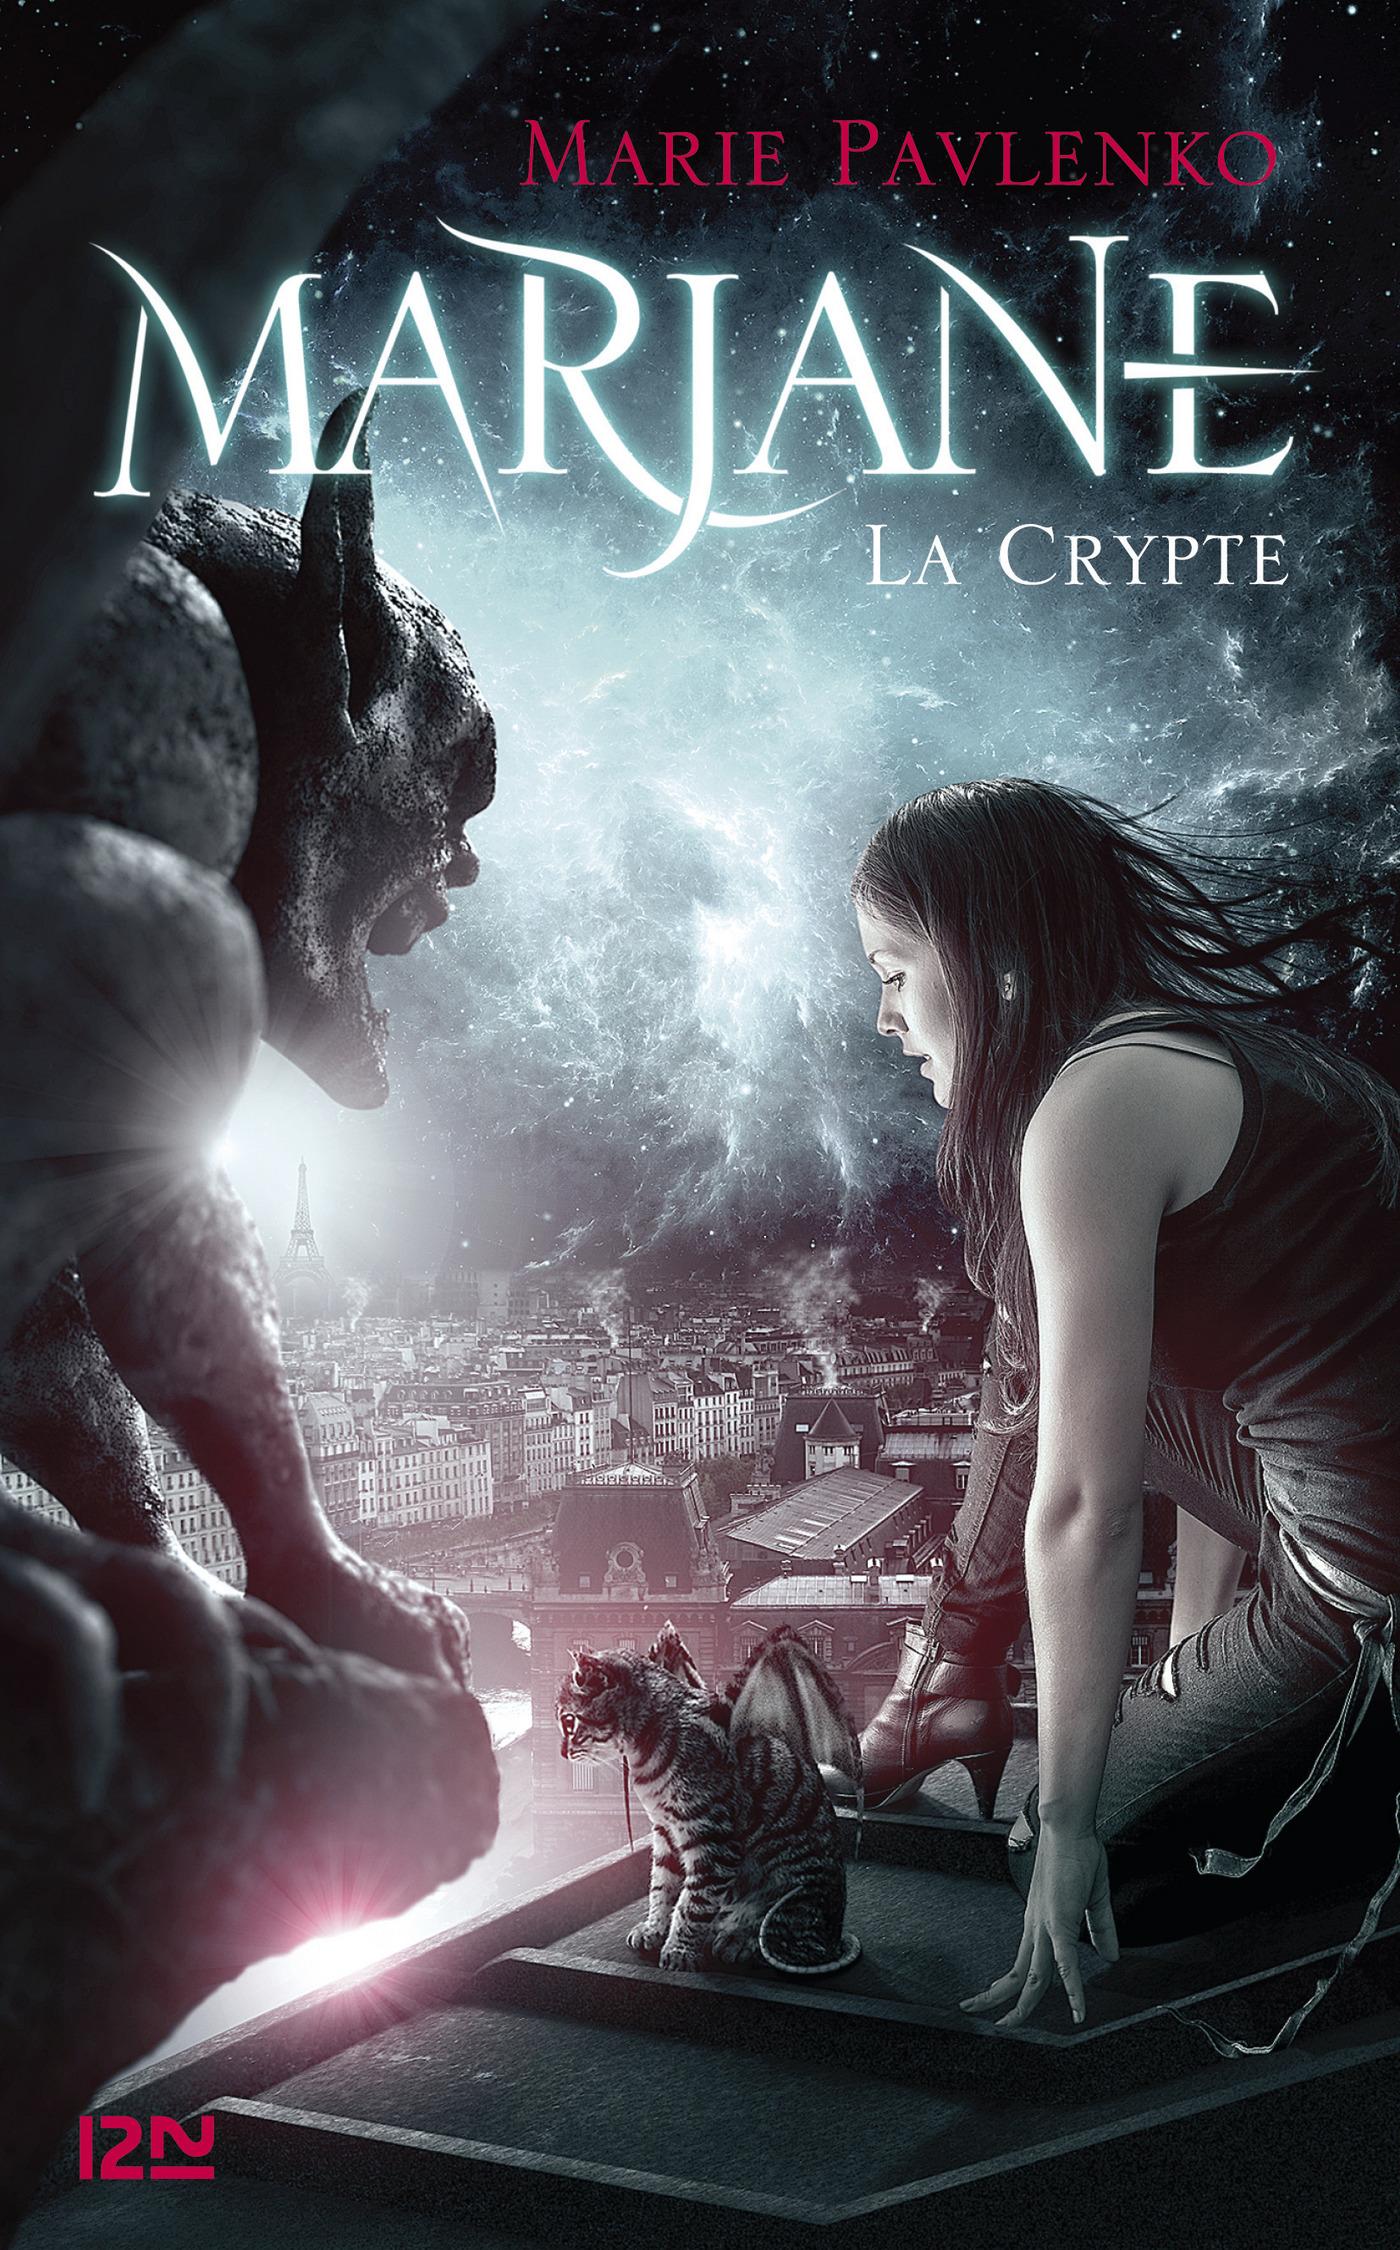 Marjane - tome 1 : La Crypte (ebook)